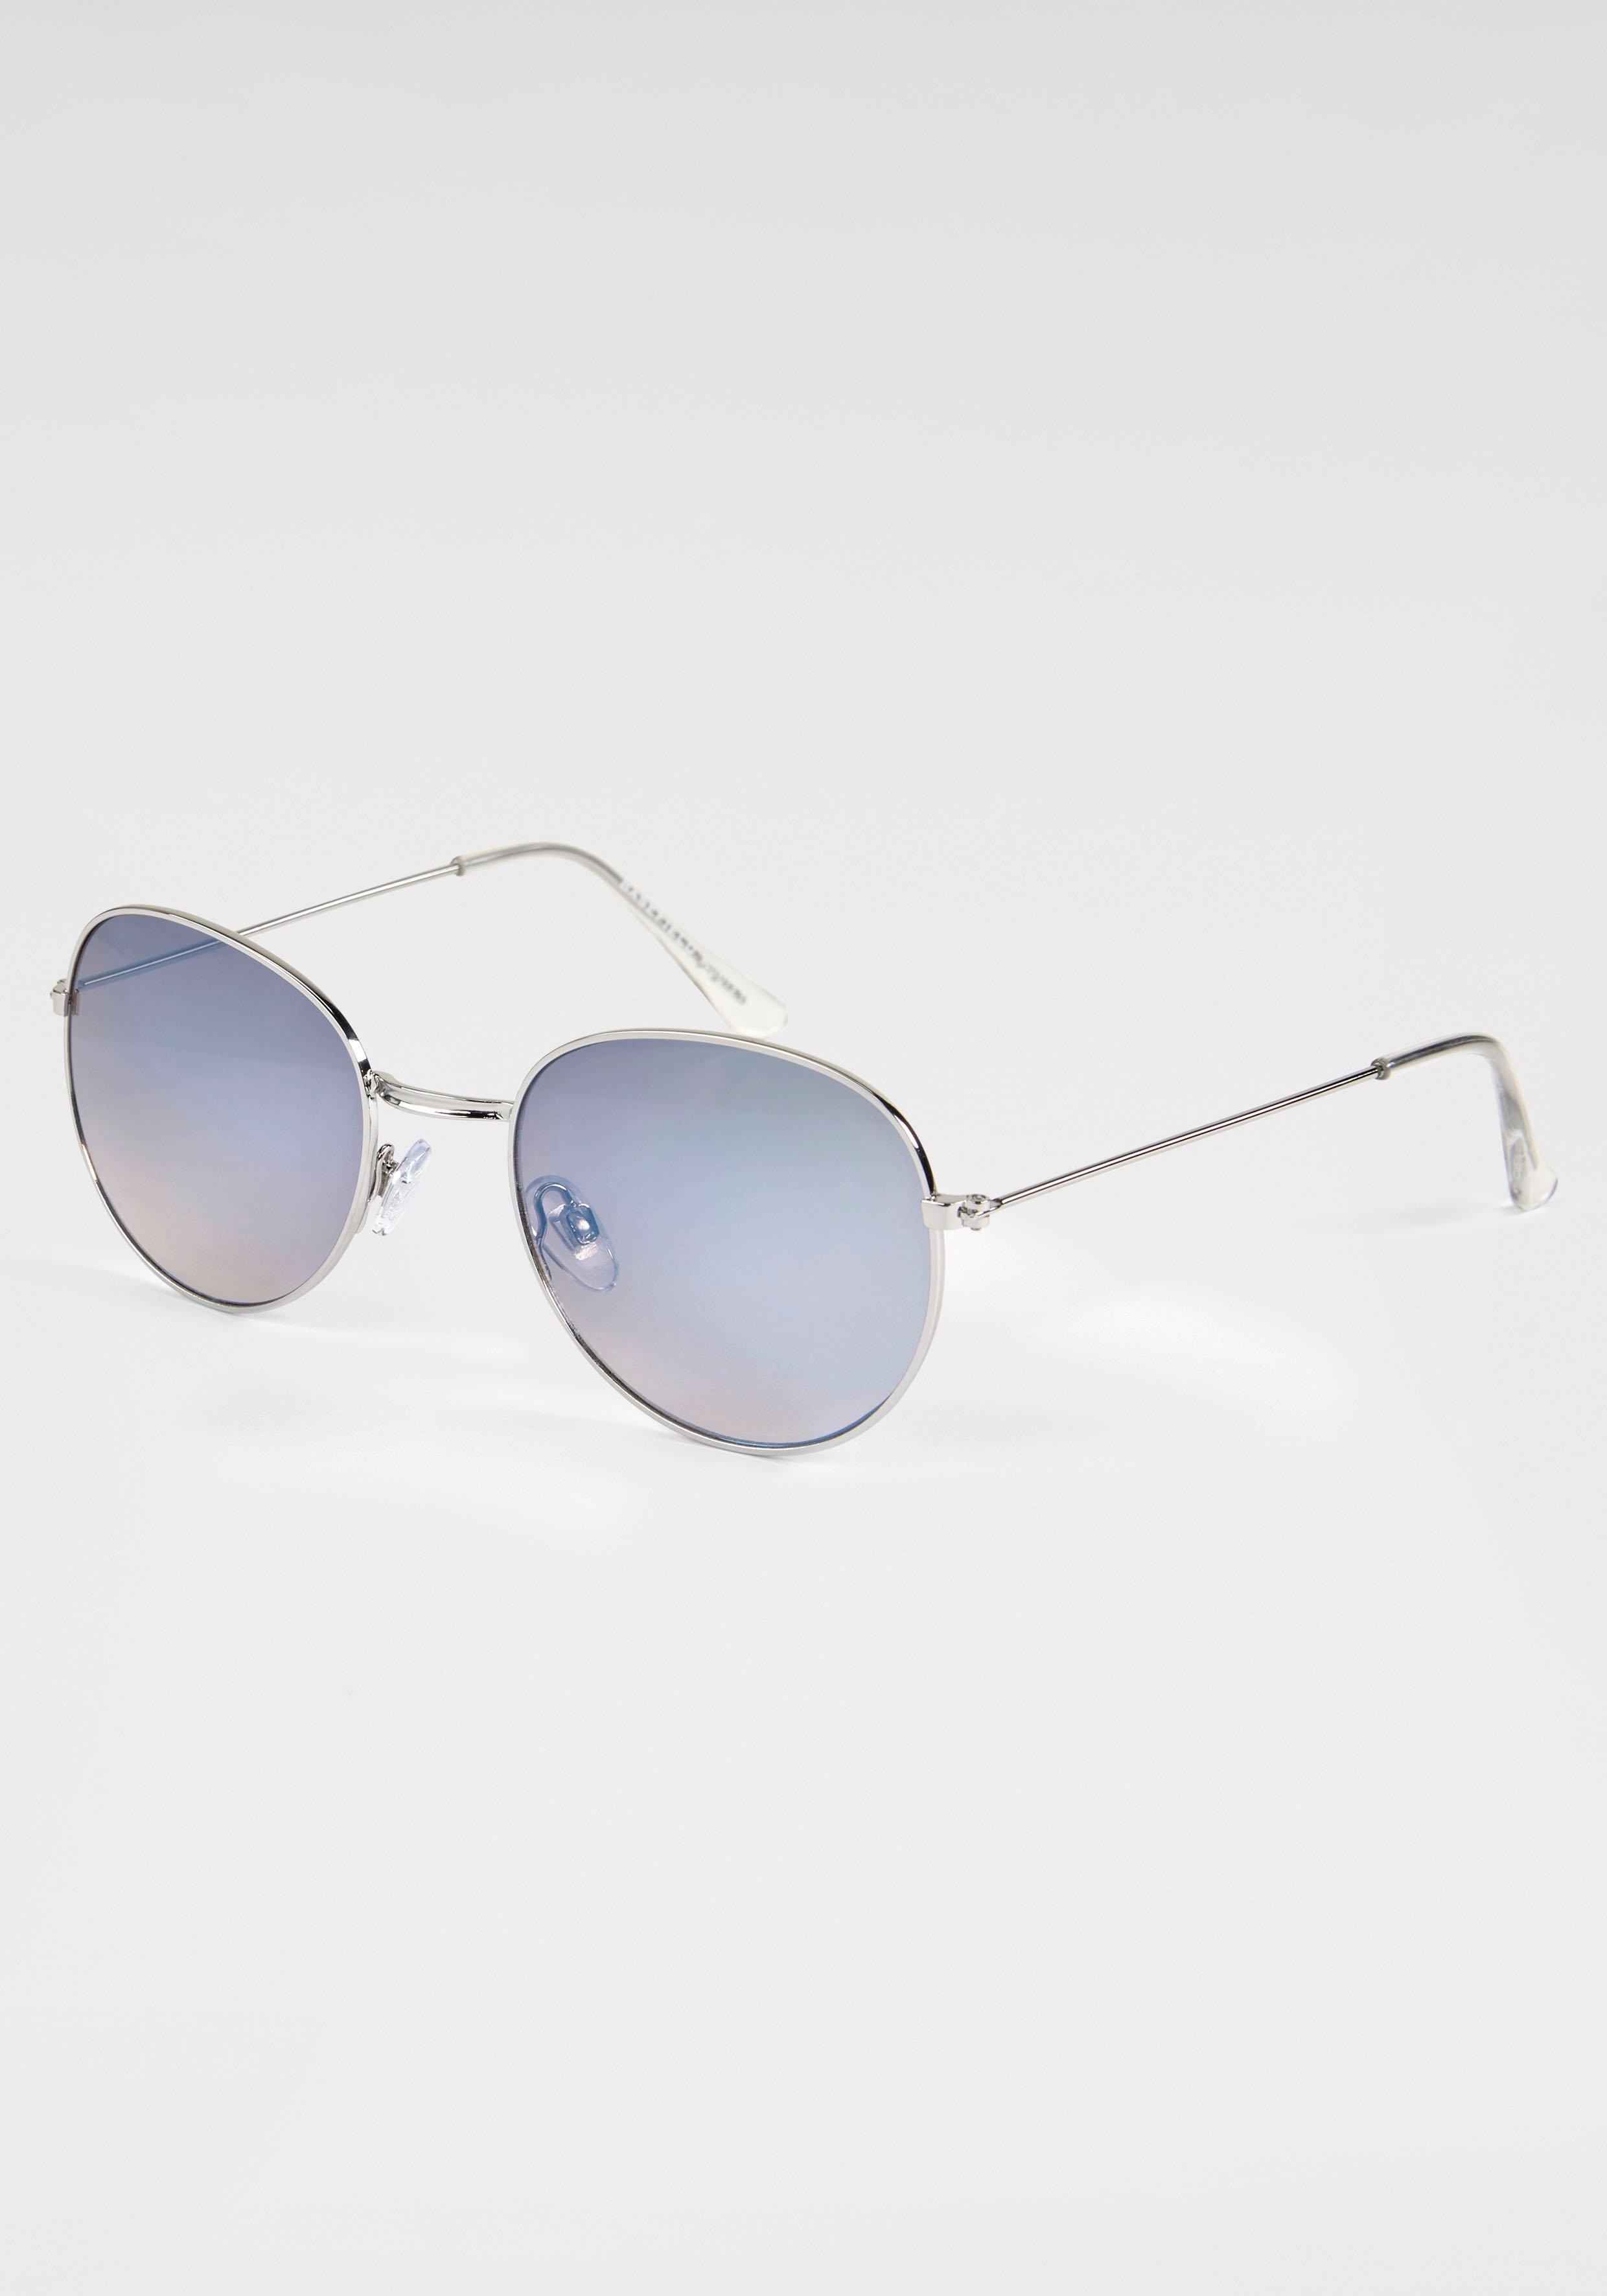 BASEFIELD zonnebril met iets spiegelende glazen nu online bestellen